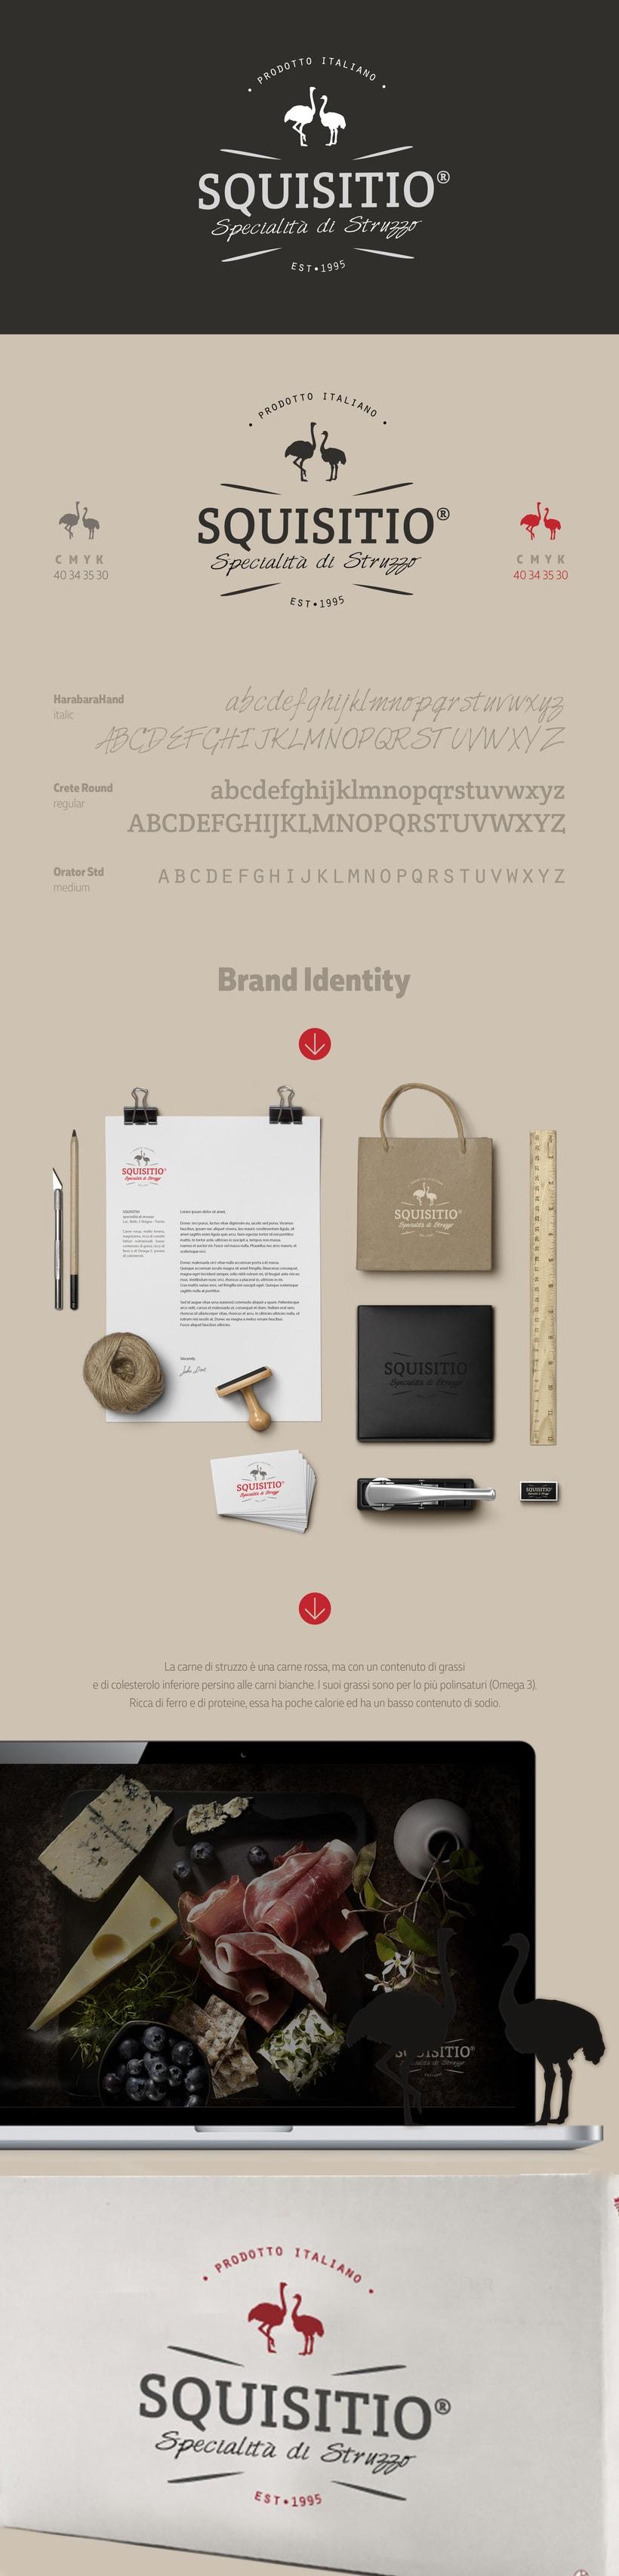 Brand Identity Squisitio - carne de avestruz -1